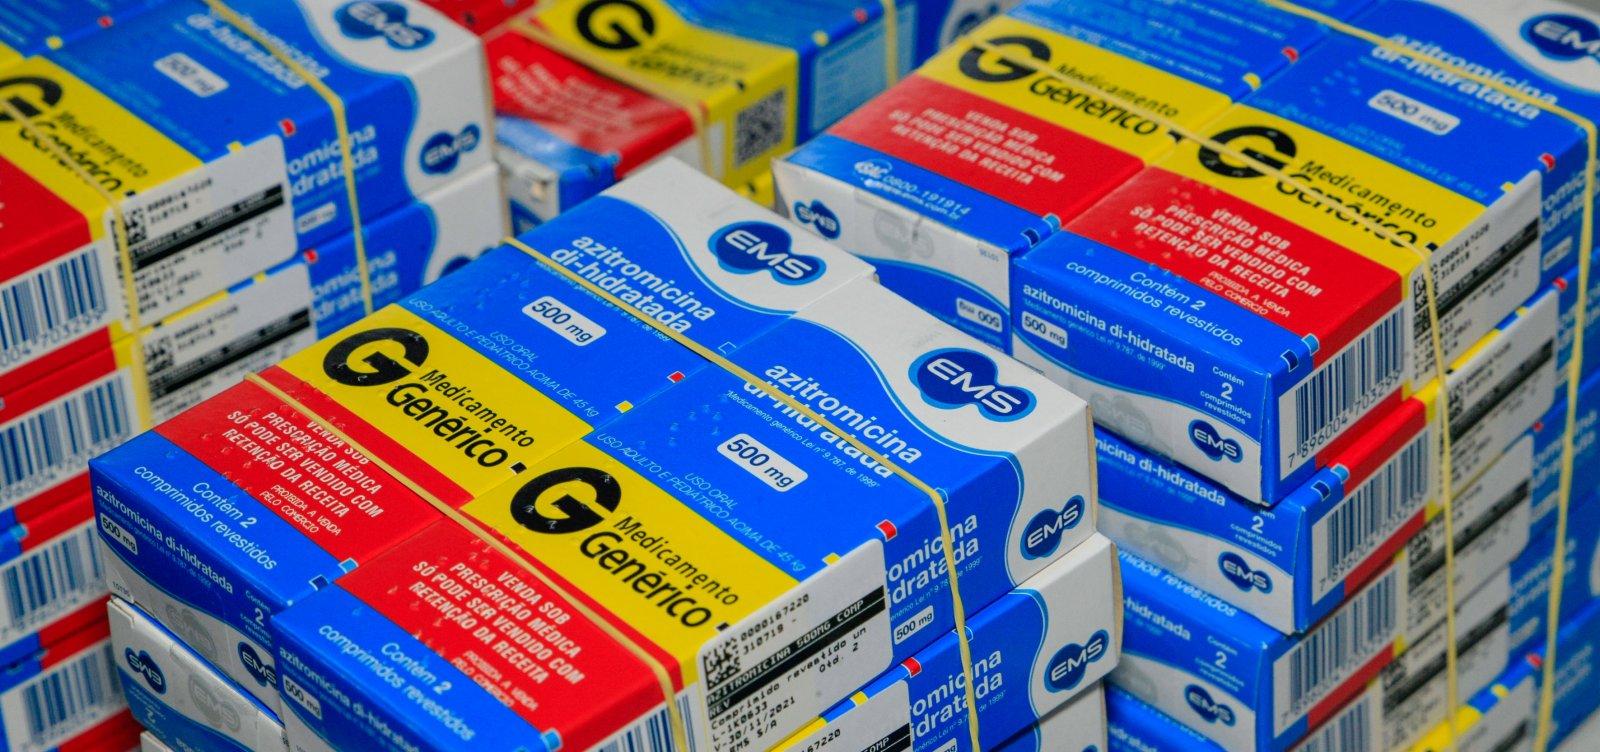 [França proíbe uso da hidroxicloroquina para tratar a Covid-19]